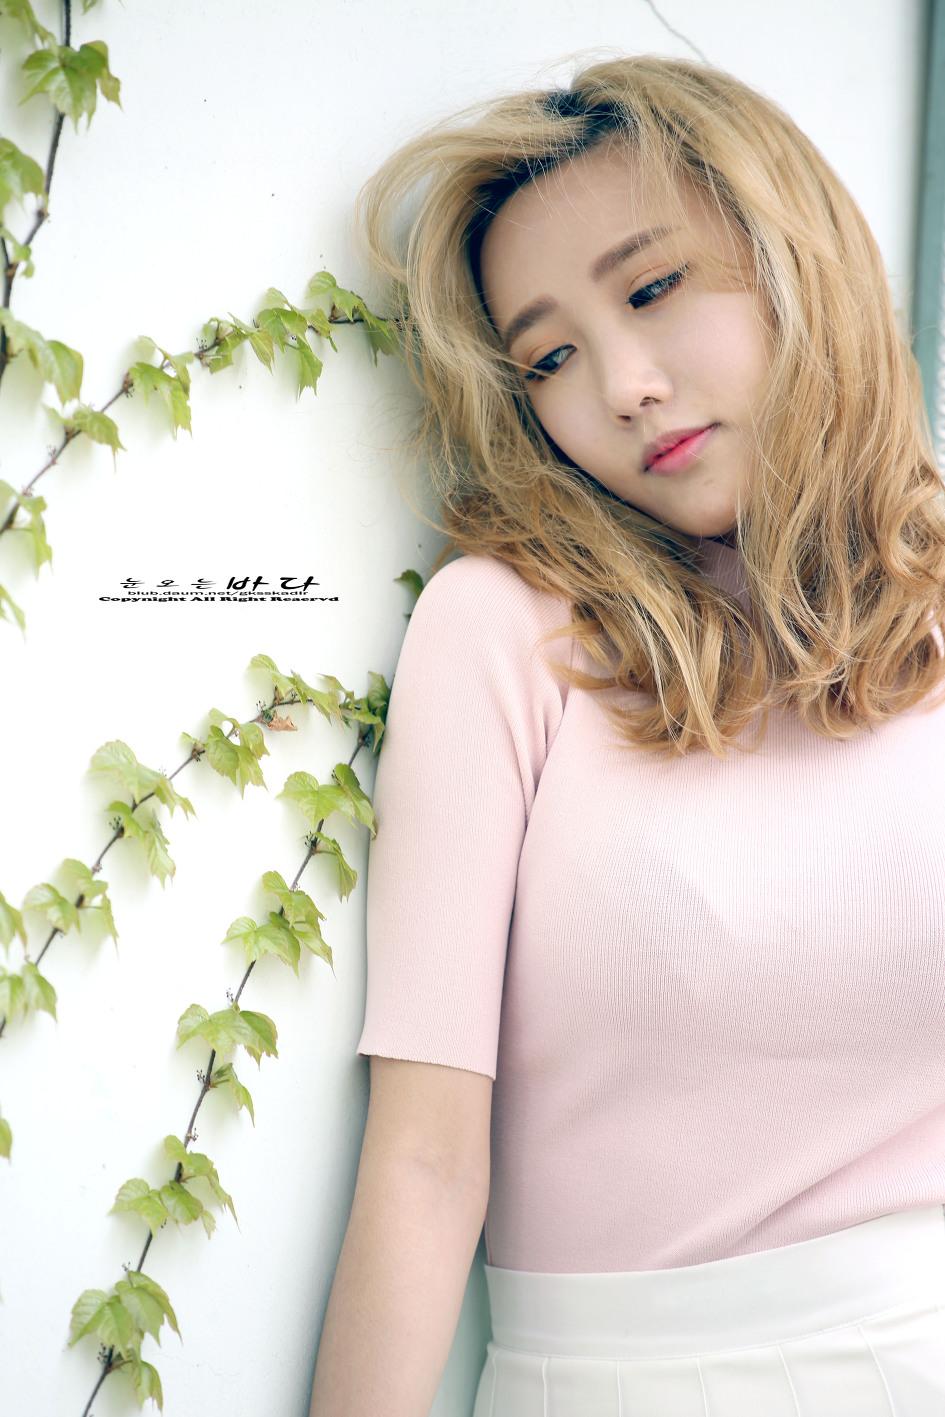 TEN PHOTO 레인보우 승아 완벽한 11자 복근2016 FW 헤라 서울 패션